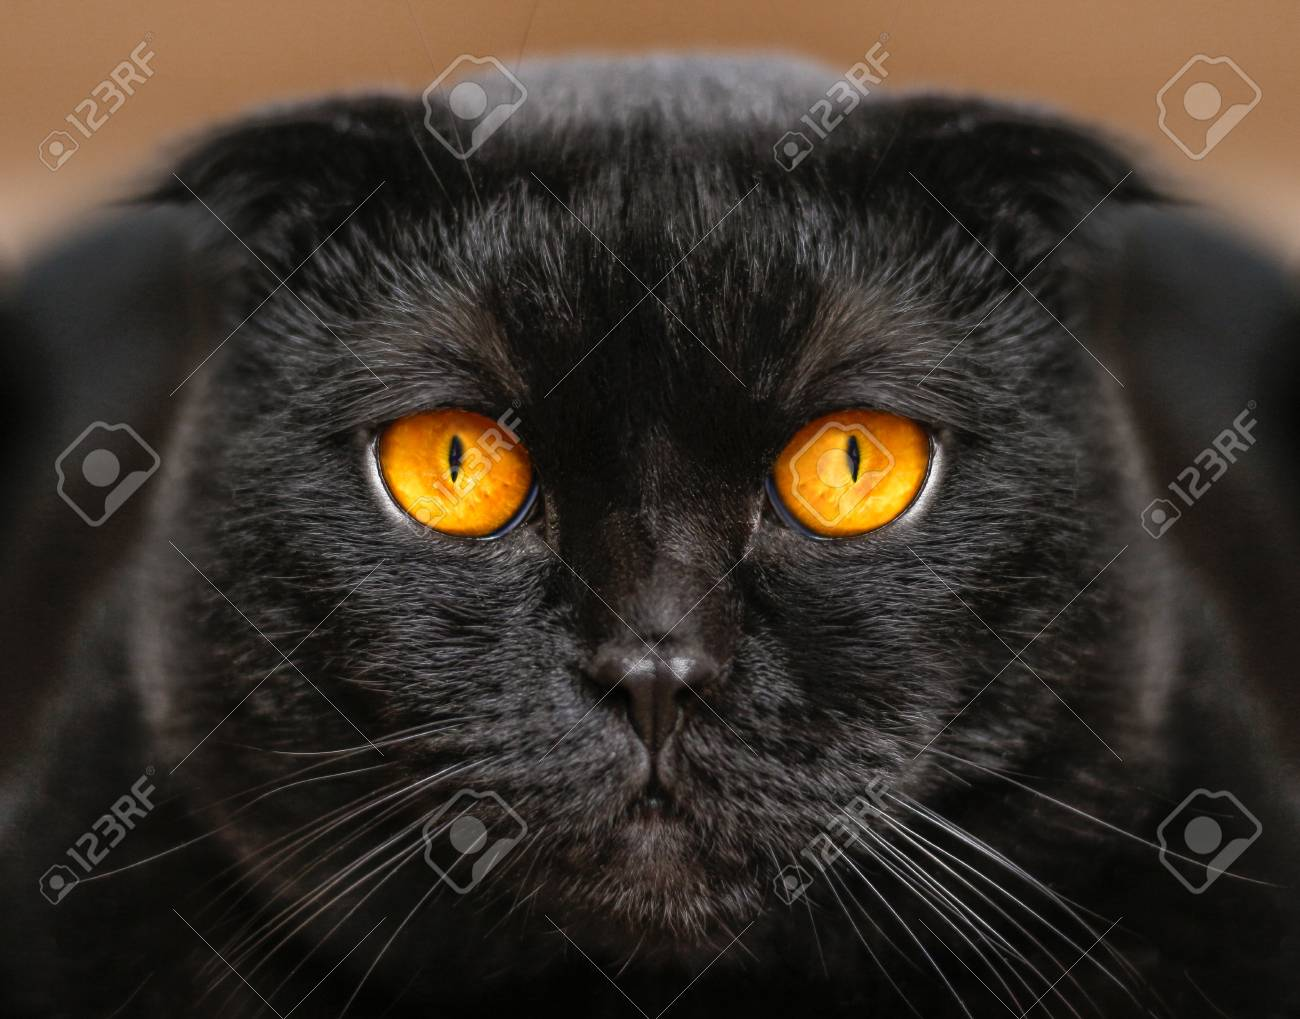 Chaud noir coq sexe